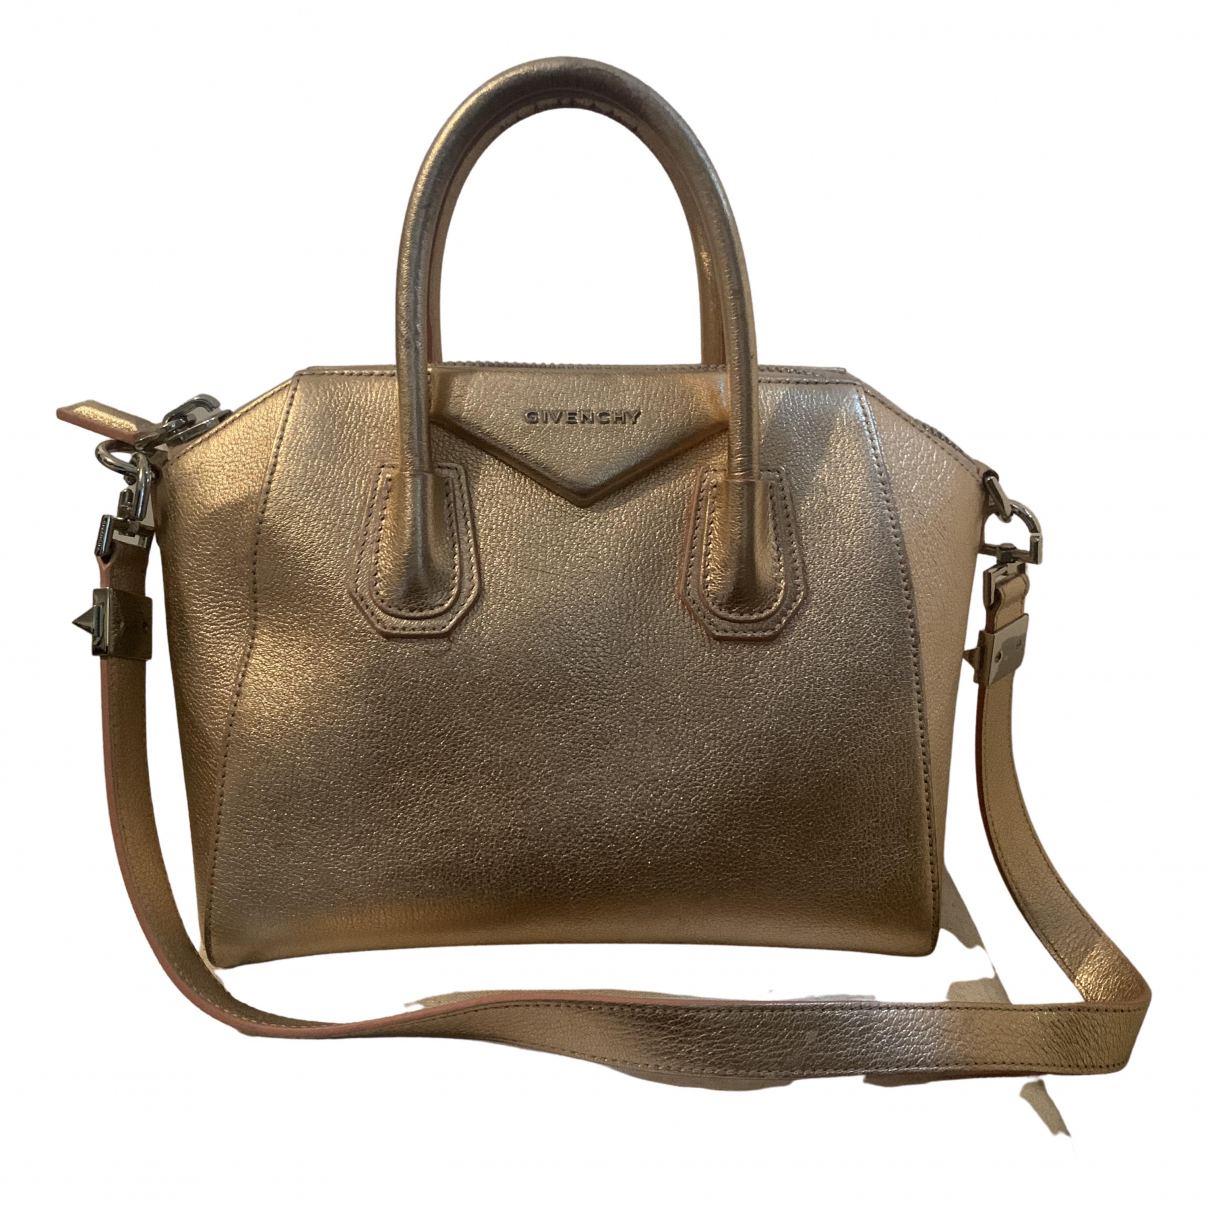 Givenchy Antigona Gold Leather handbag for Women \N